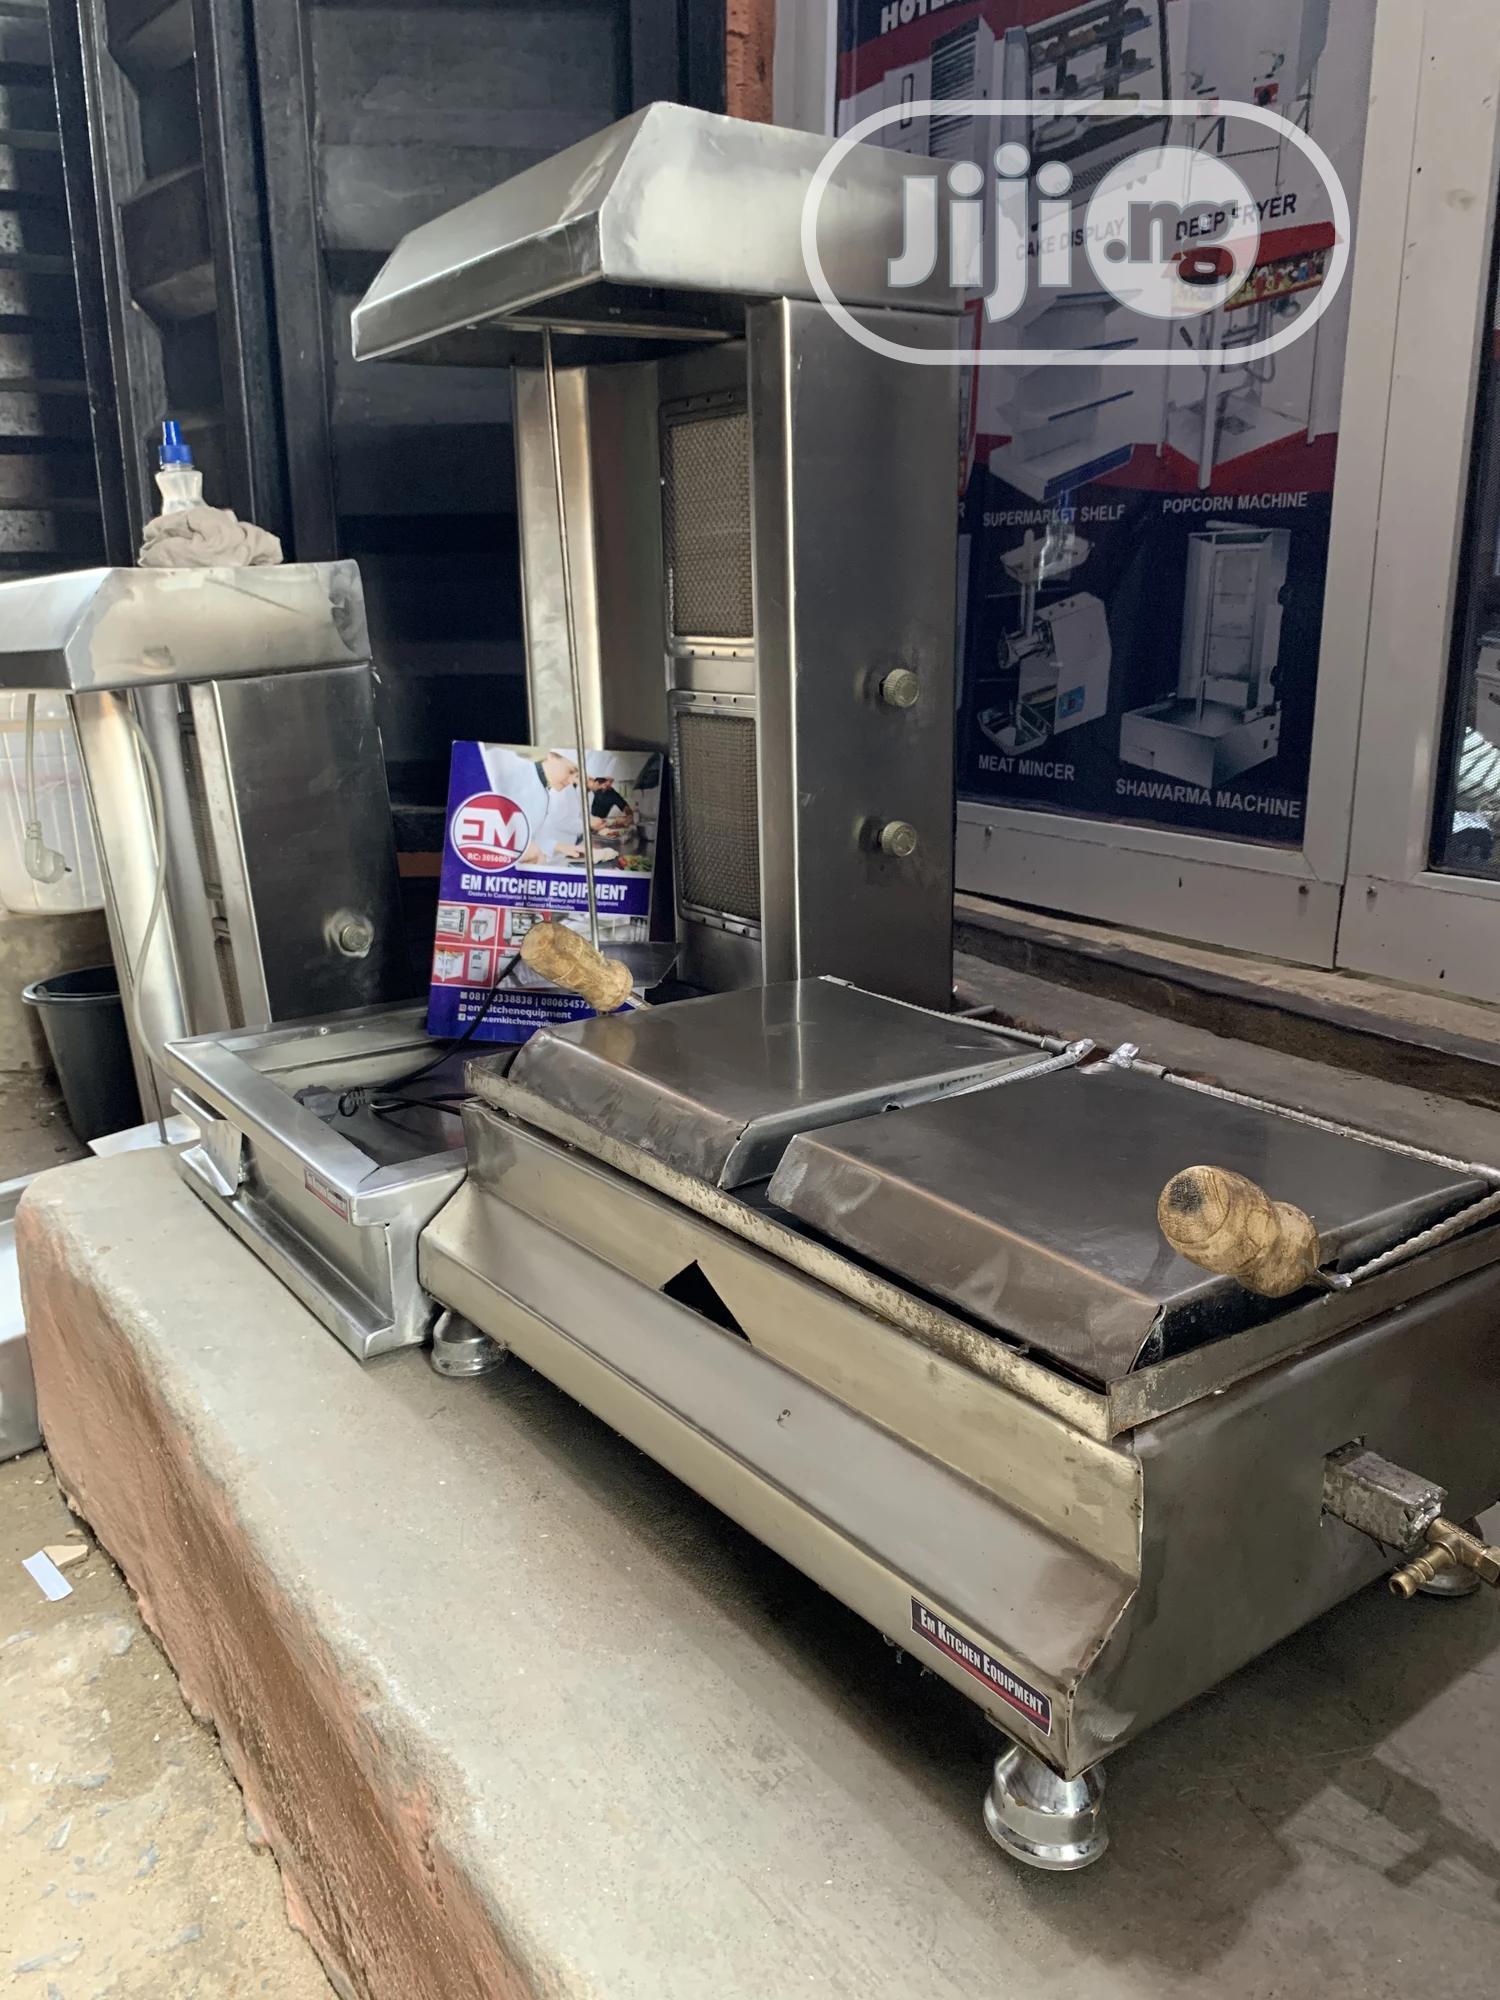 Shawarma Machine Grill And Toaster